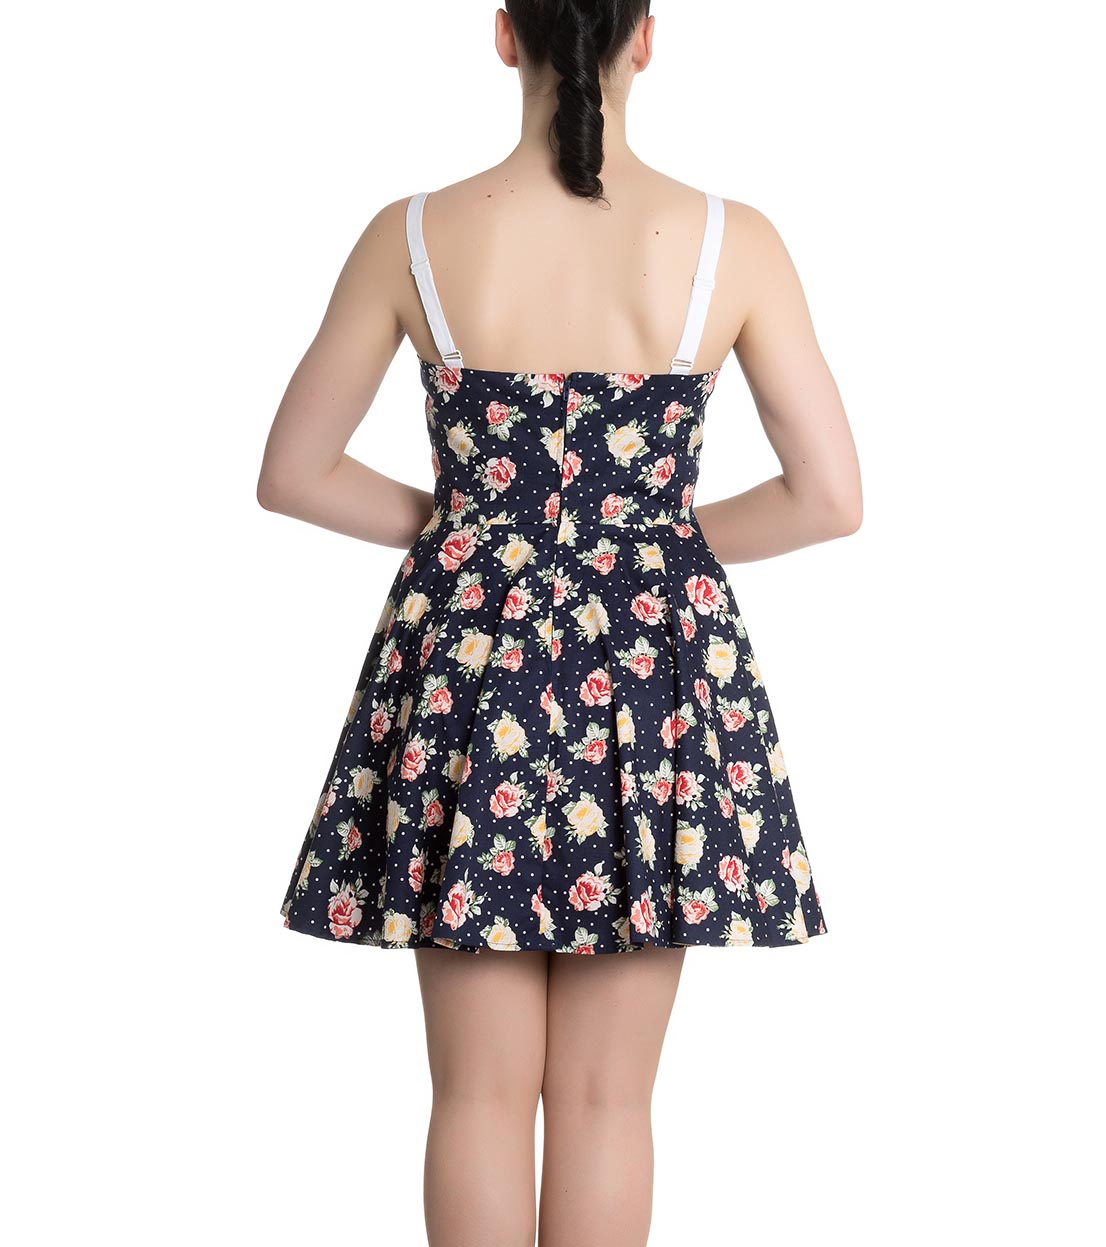 Hell-Bunny-Navy-Blue-Floral-Roses-Flowers-Mini-Dress-EMMA-Polka-Dot-All-Sizes thumbnail 25